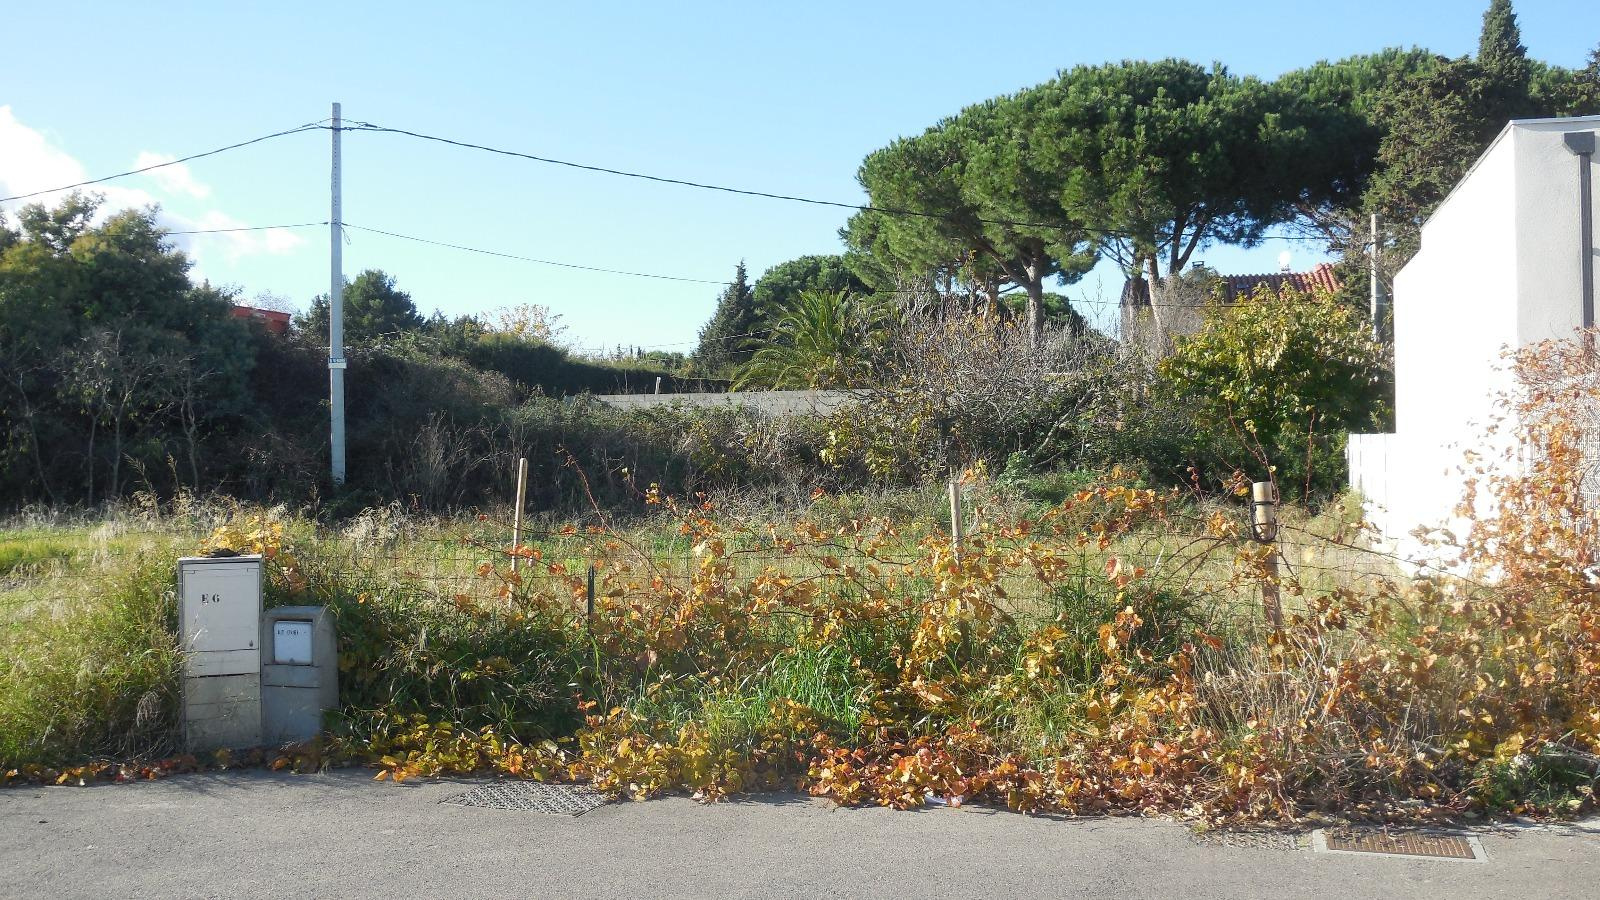 Vente terrain de 400 m2 for Gartengestaltung 400 m2